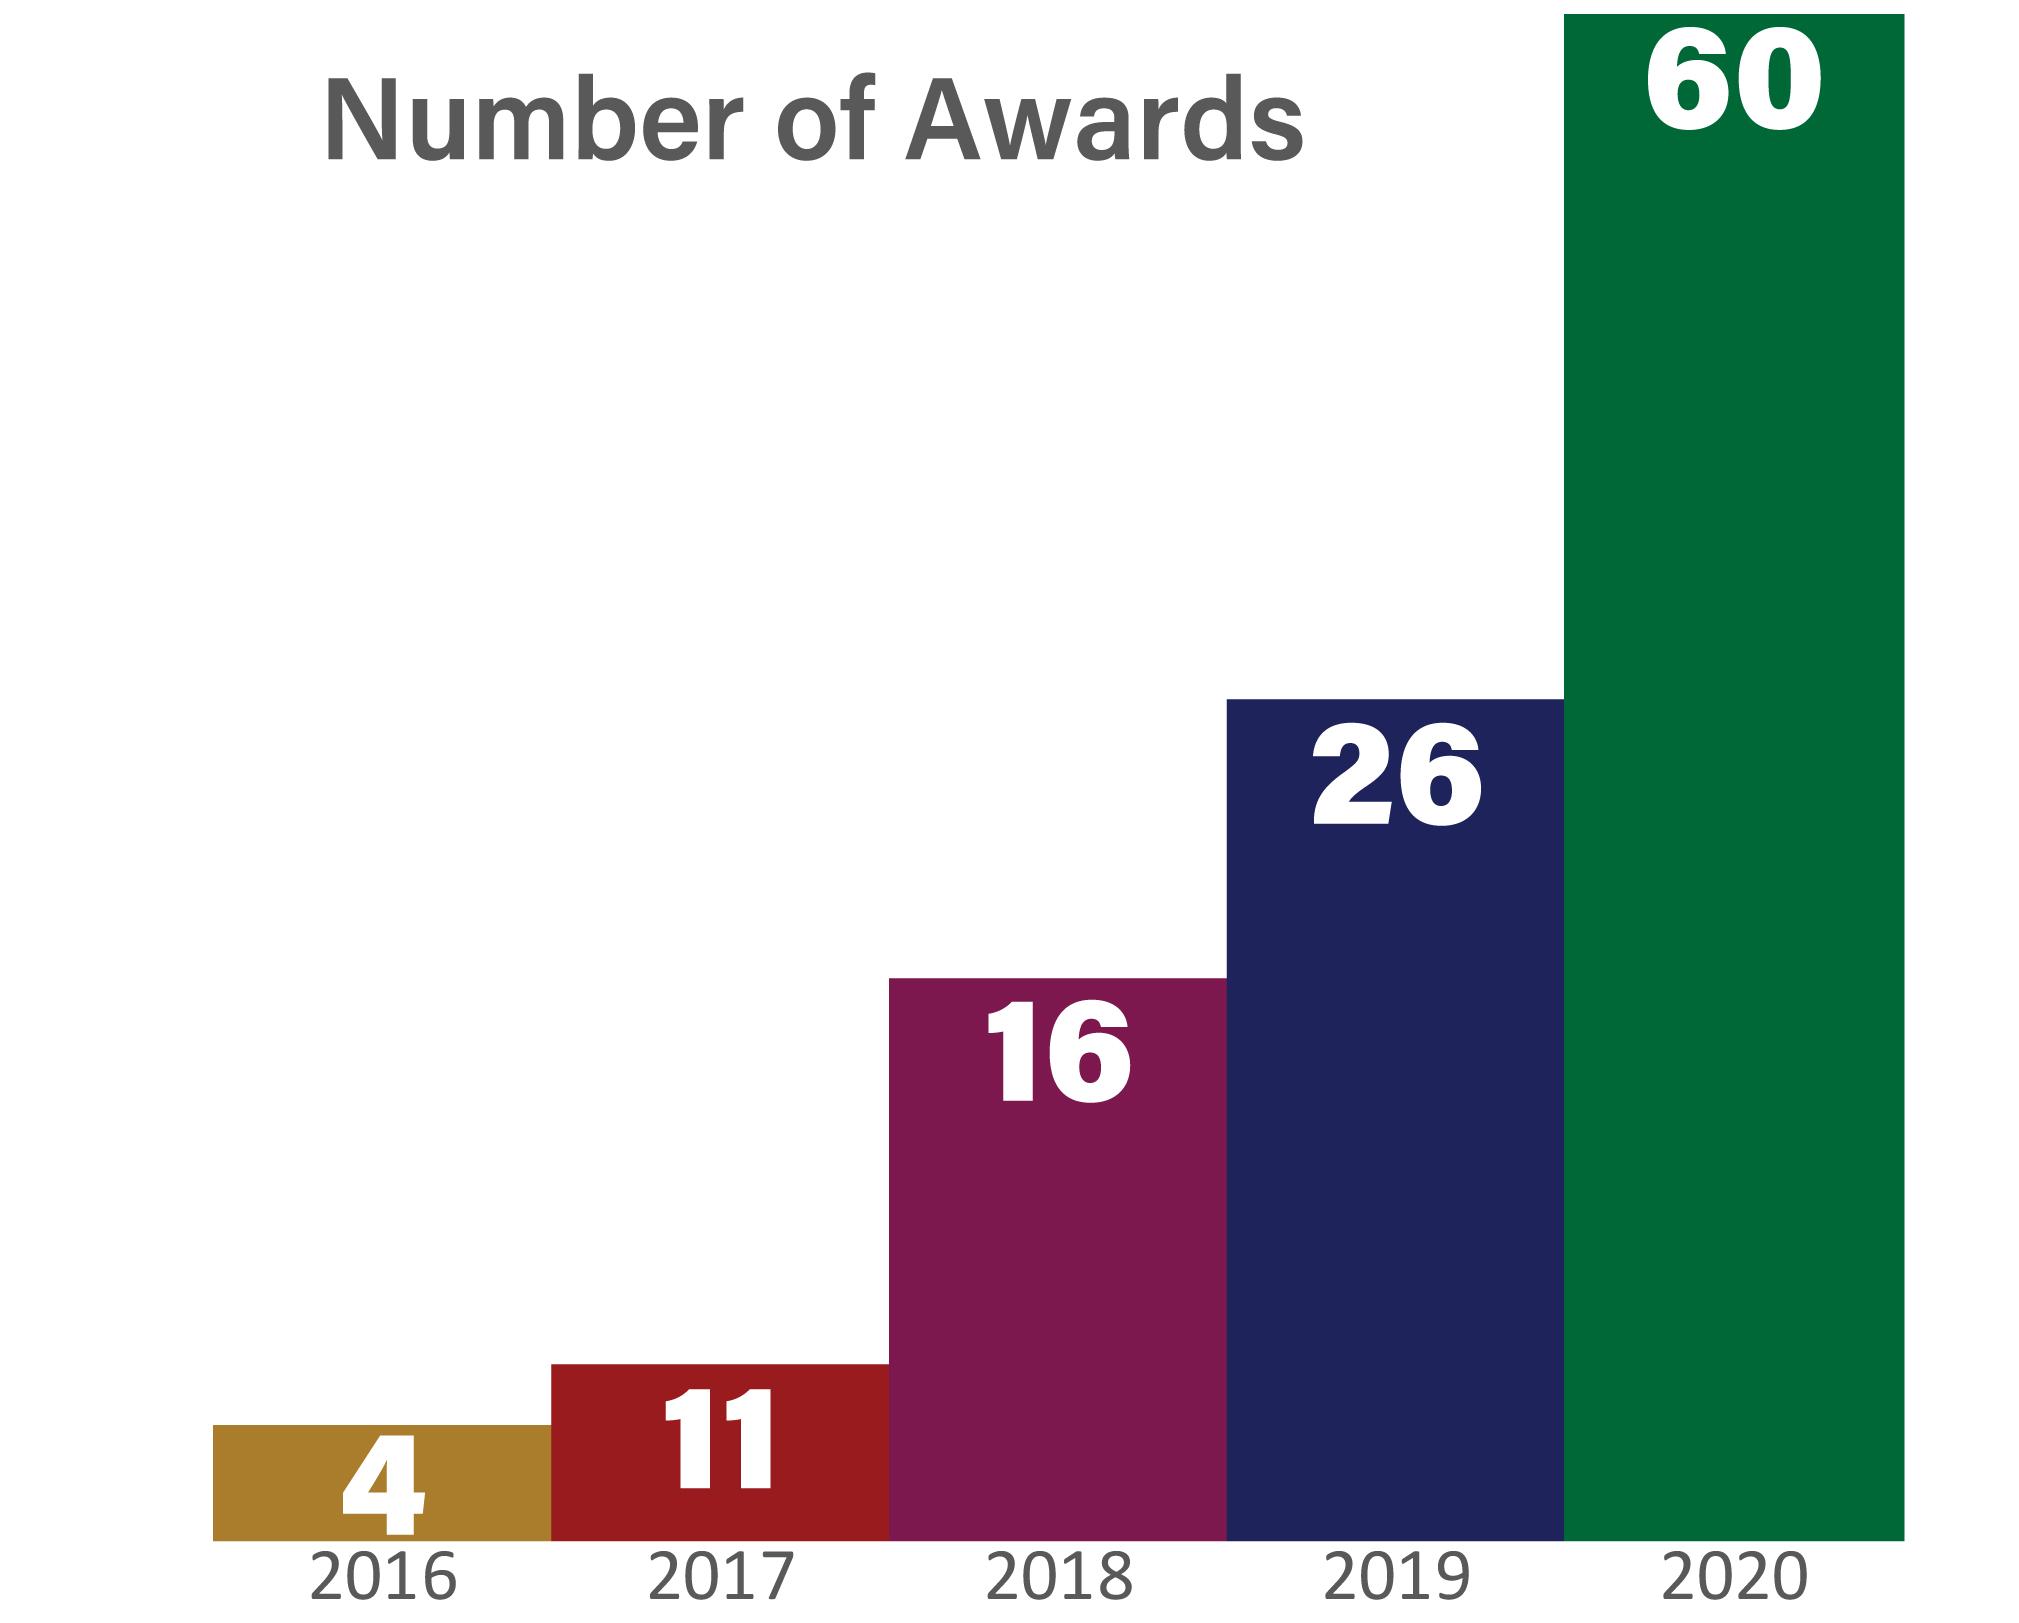 Number of Awards: 2016: 4, 2017: 11; 2018: 16; 2019: 26; 2020: 60